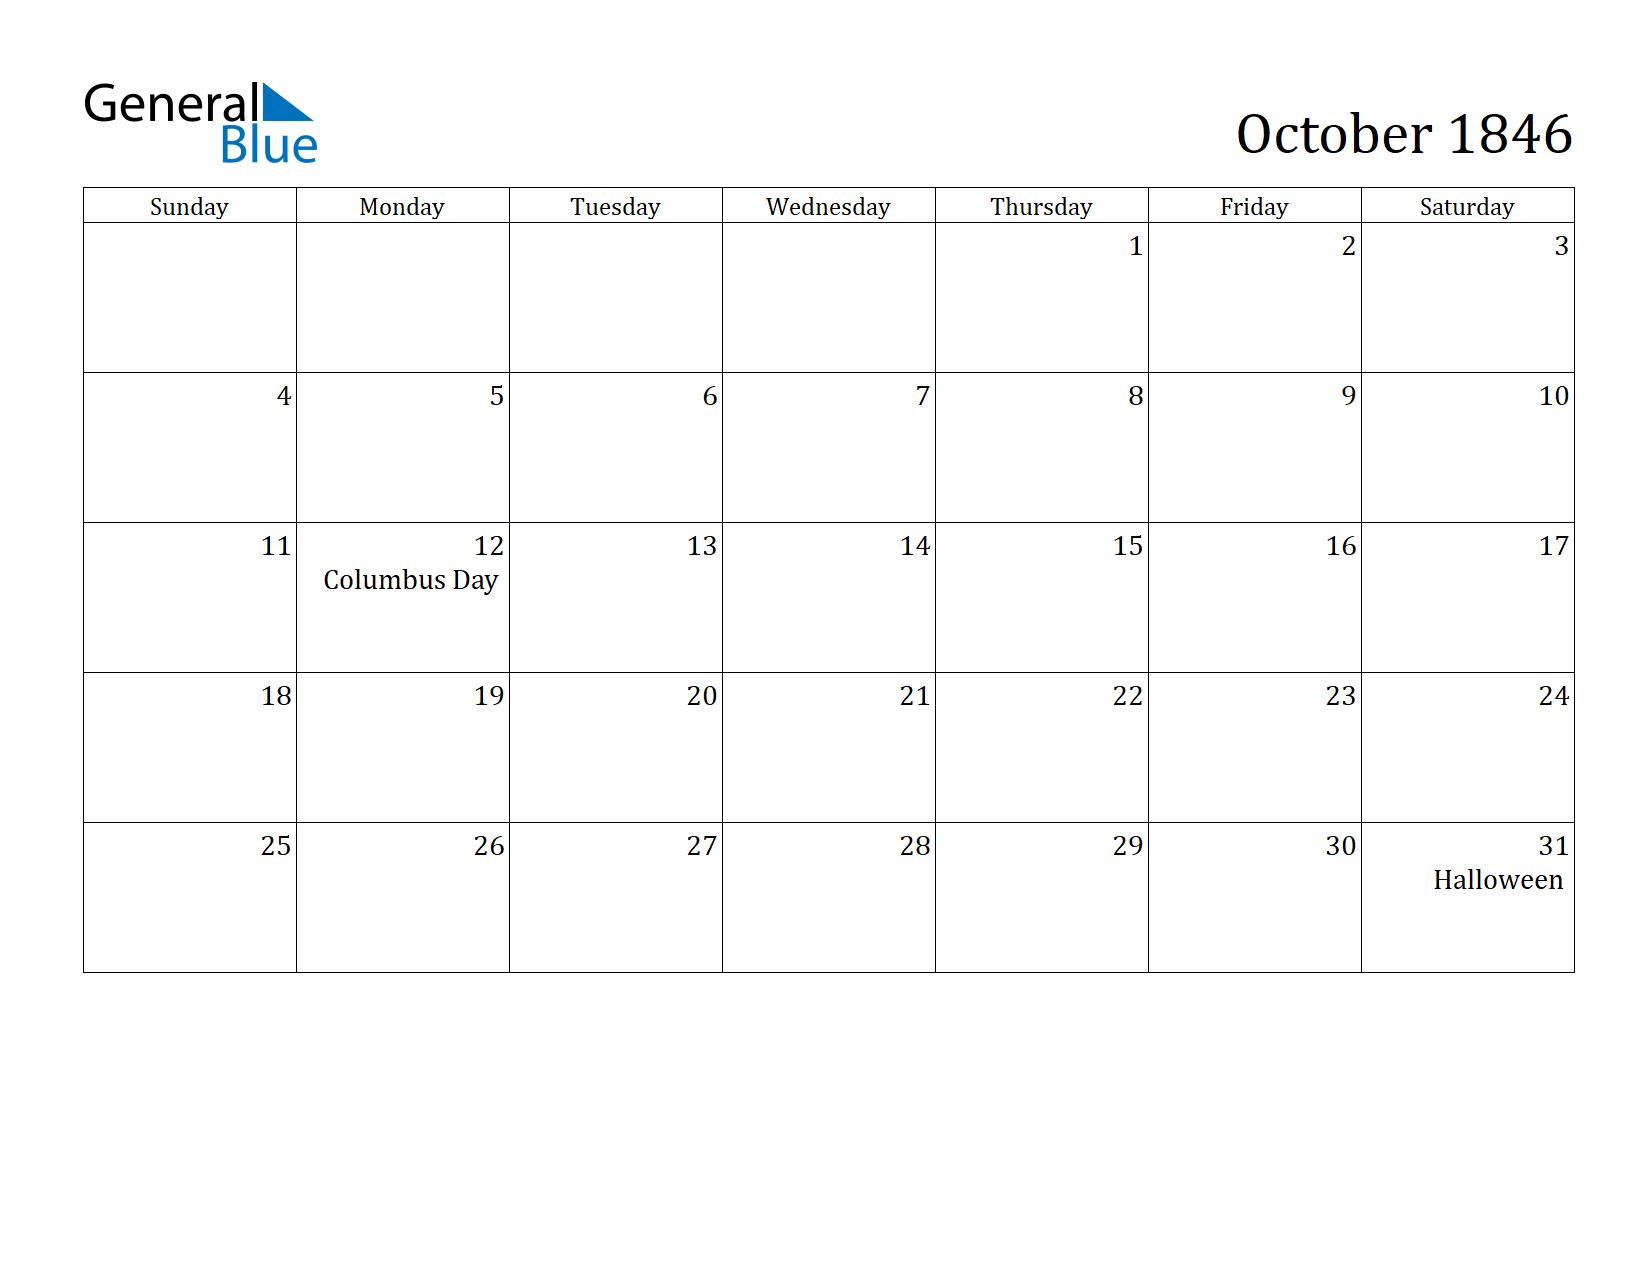 Image of October 1846 Calendar